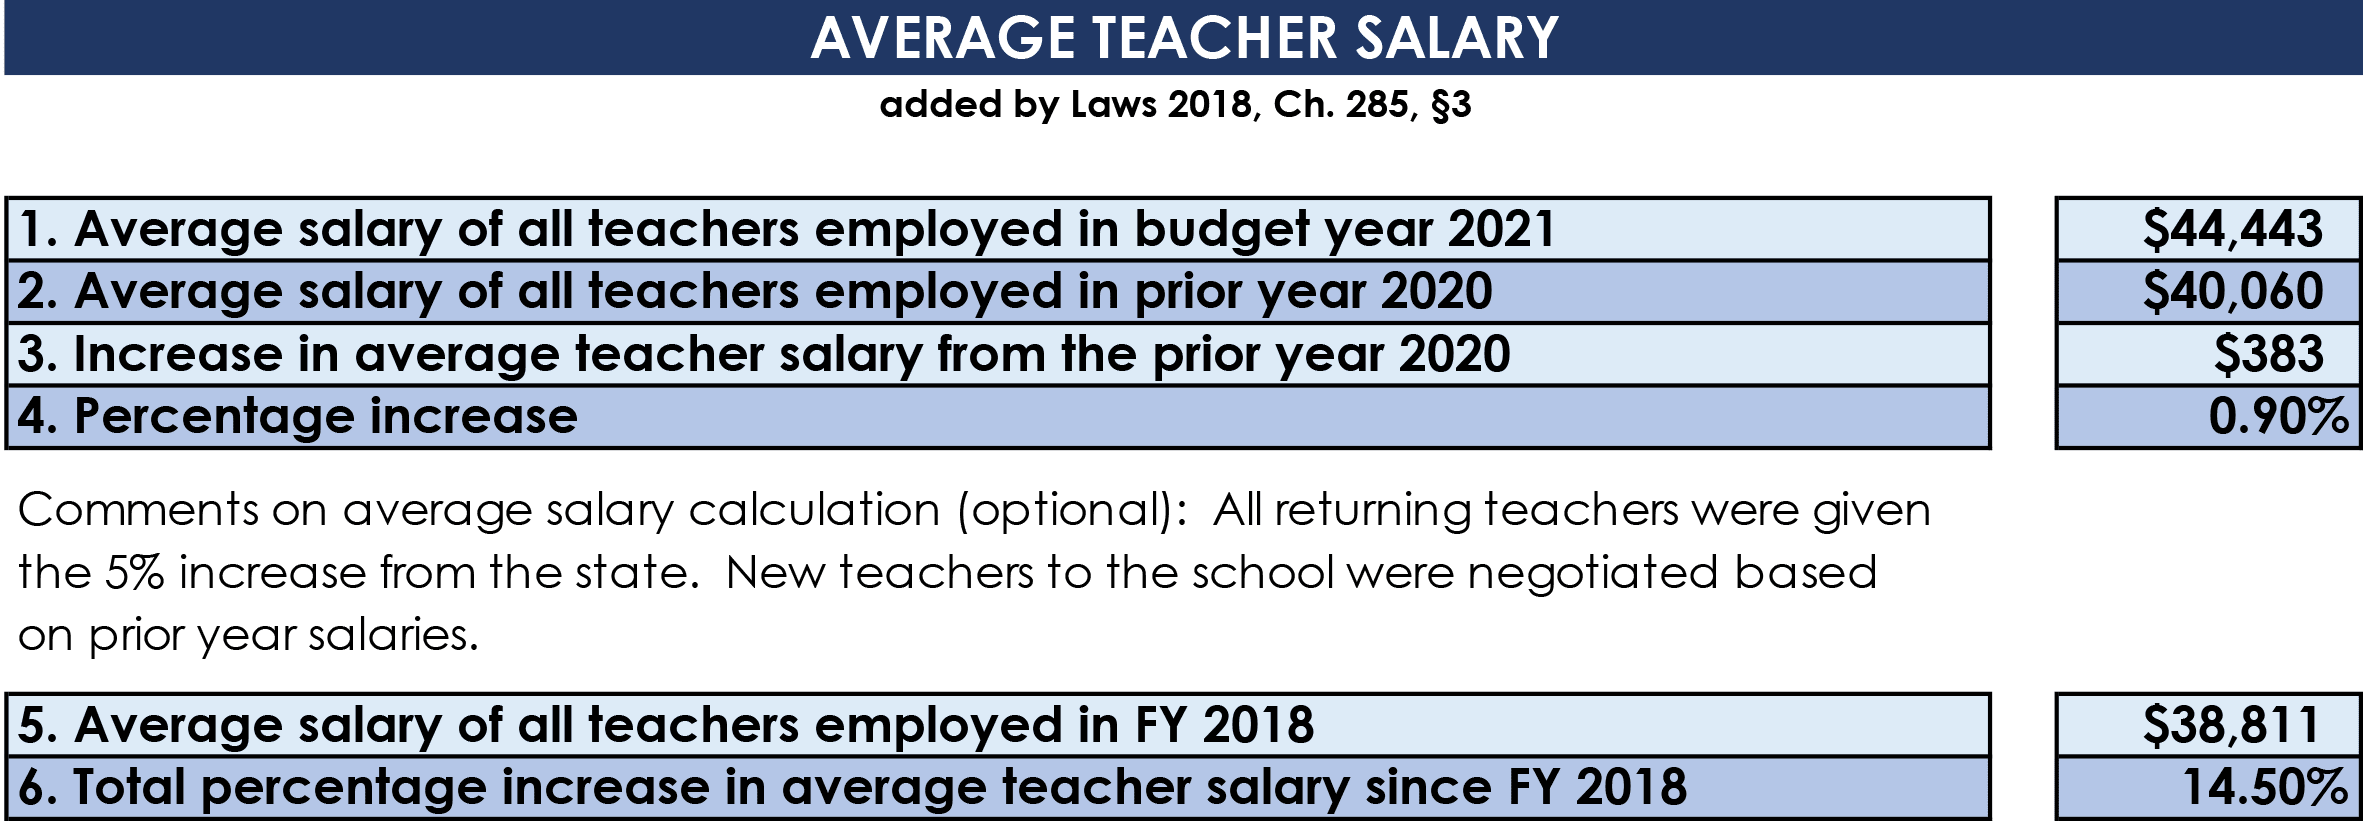 Average Teacher Salary